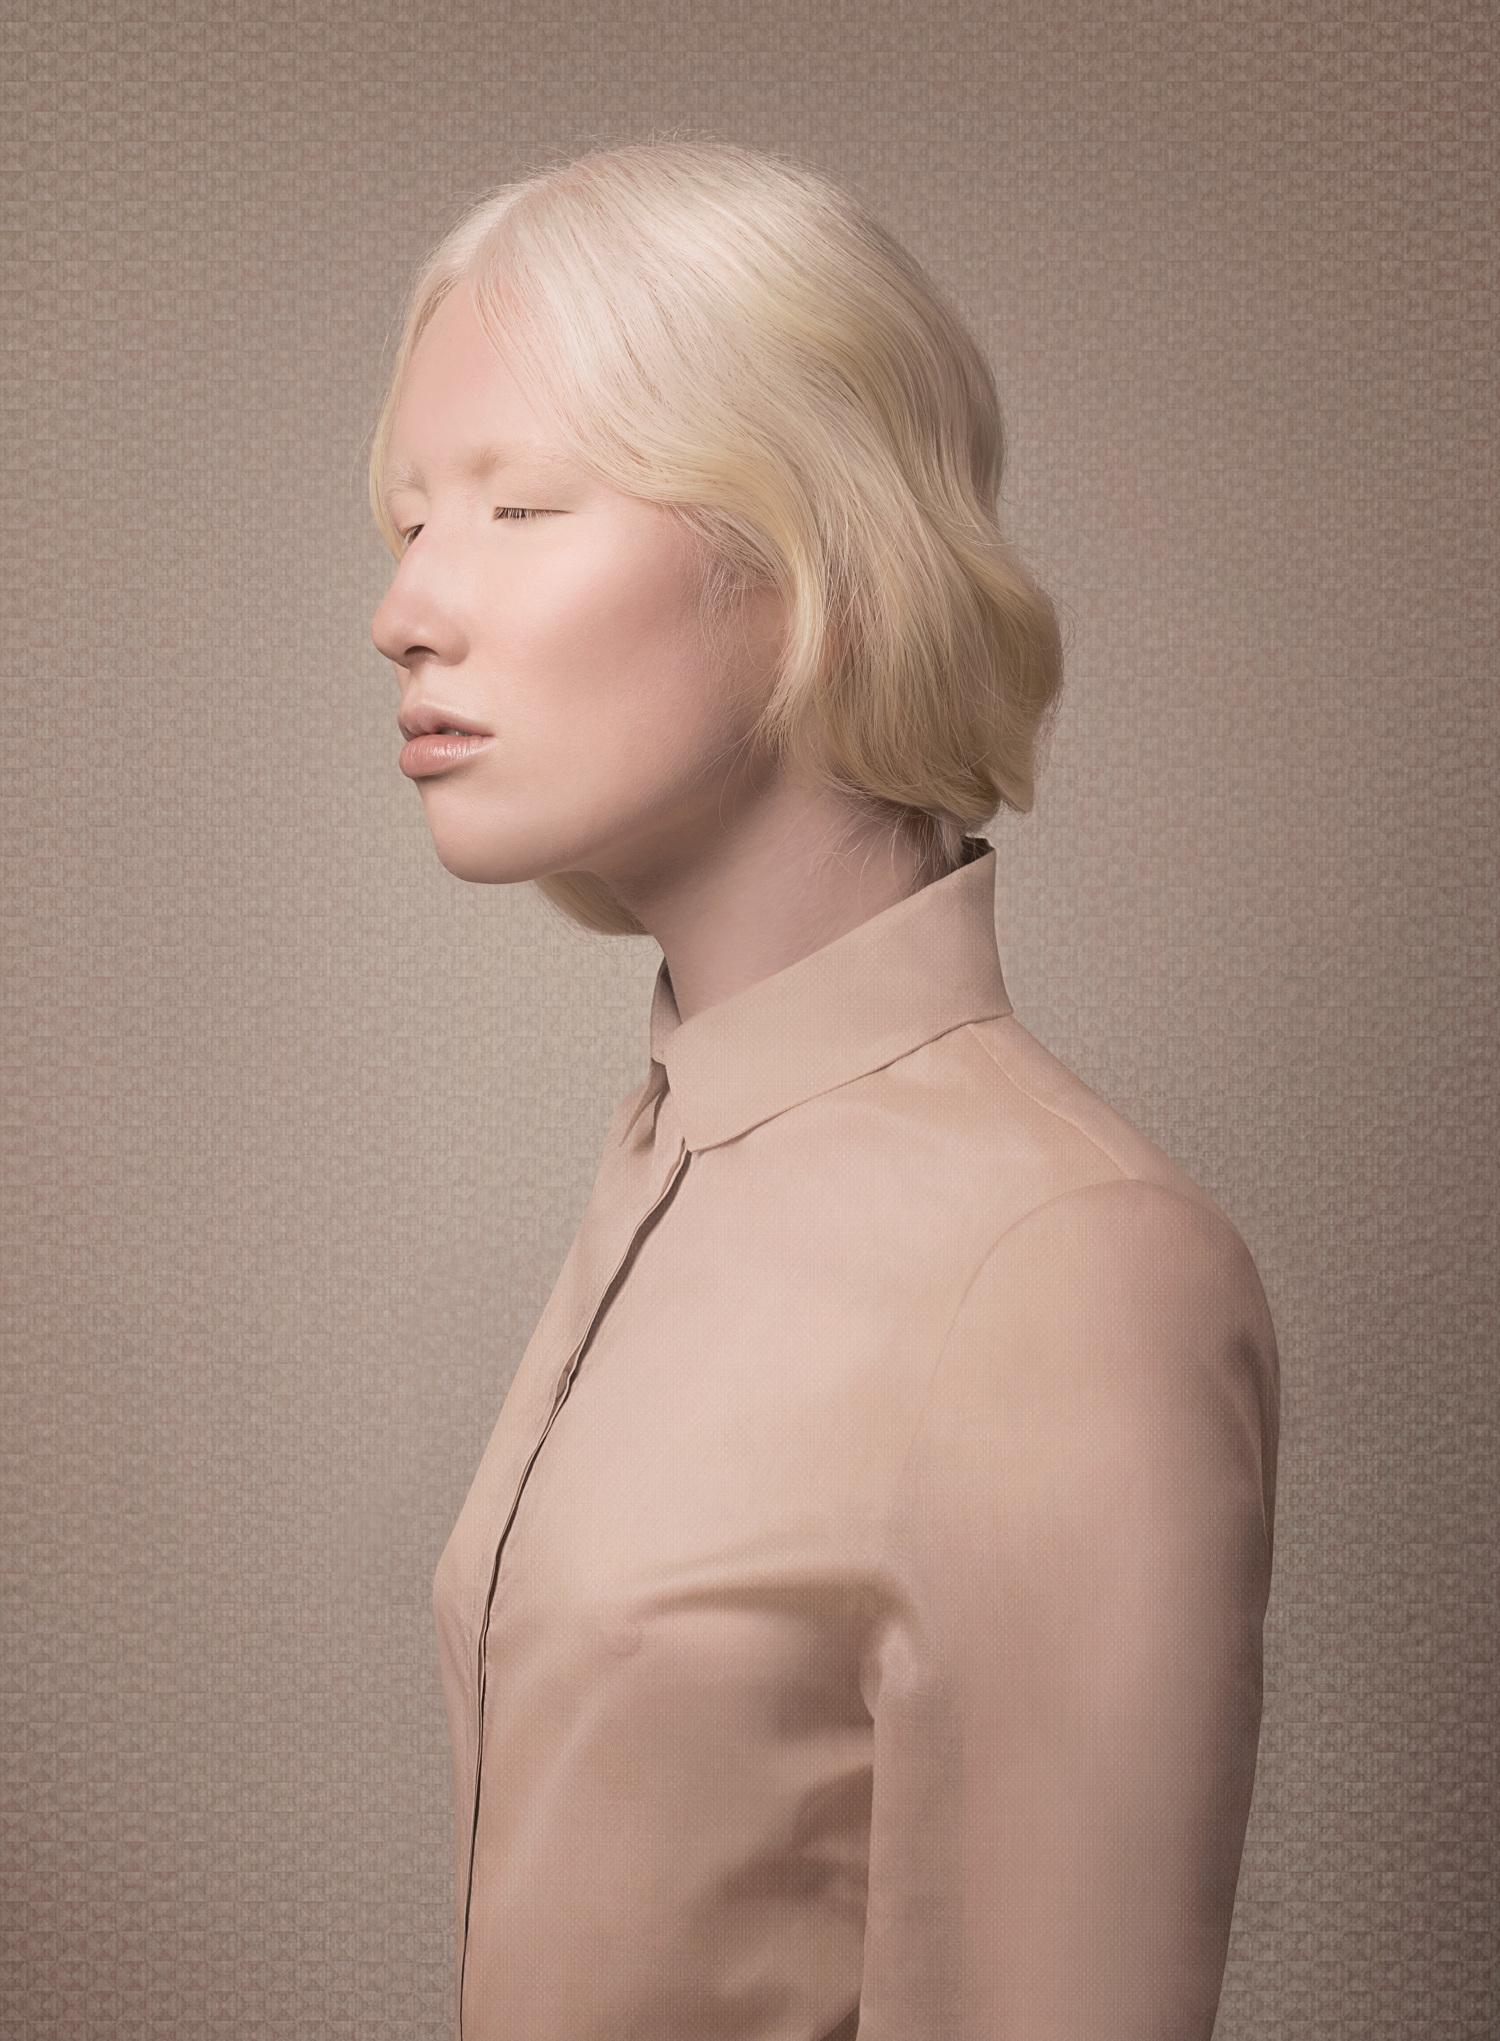 Nude (Introspect), 2014 © Justine Tjallinks